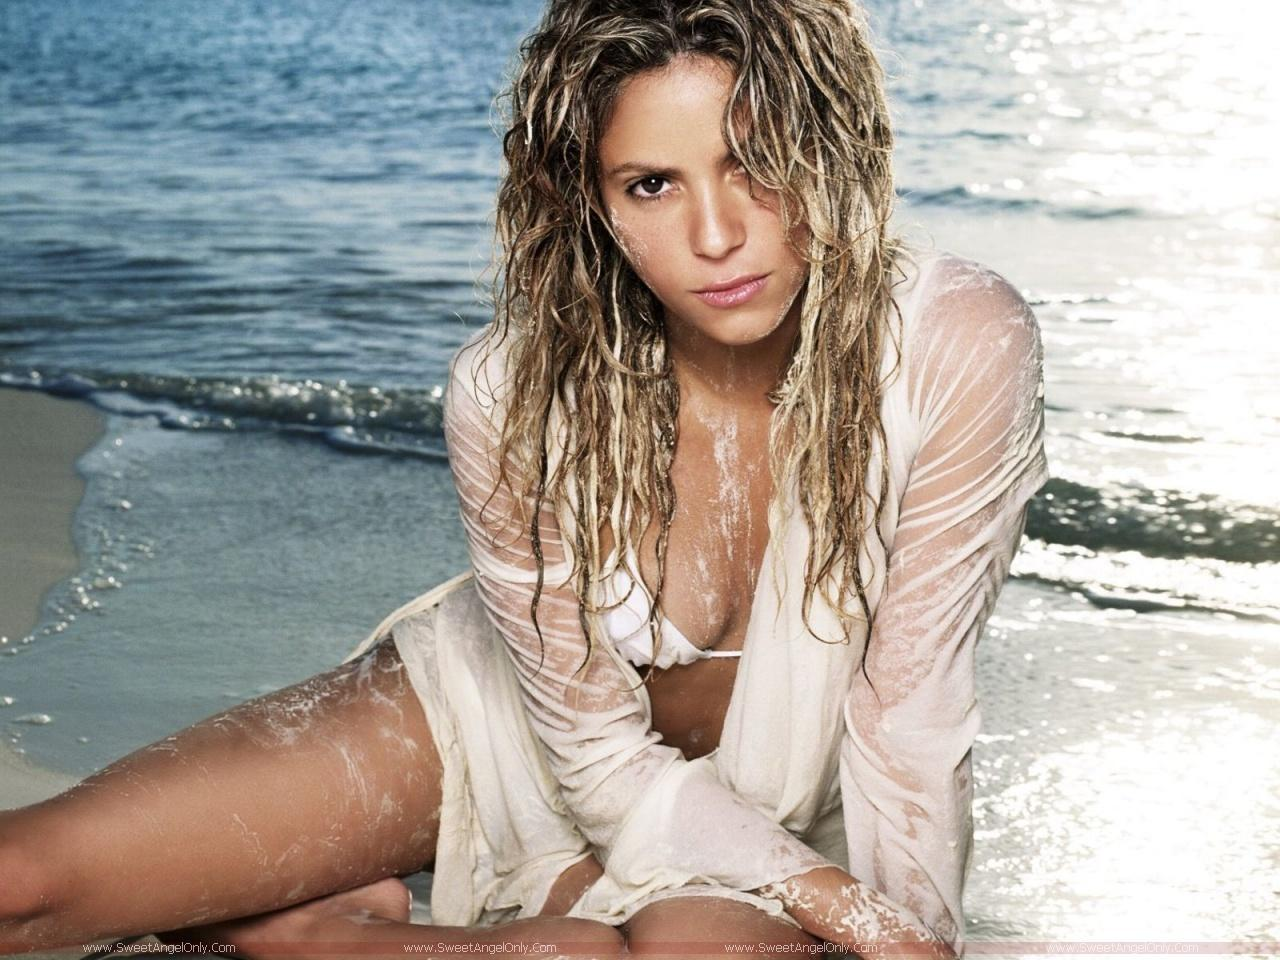 http://3.bp.blogspot.com/-nrWNOKriA1o/Tird2tHoHTI/AAAAAAAAHrA/oasjQoFGlgw/s1600/Shakira_sweet.jpg